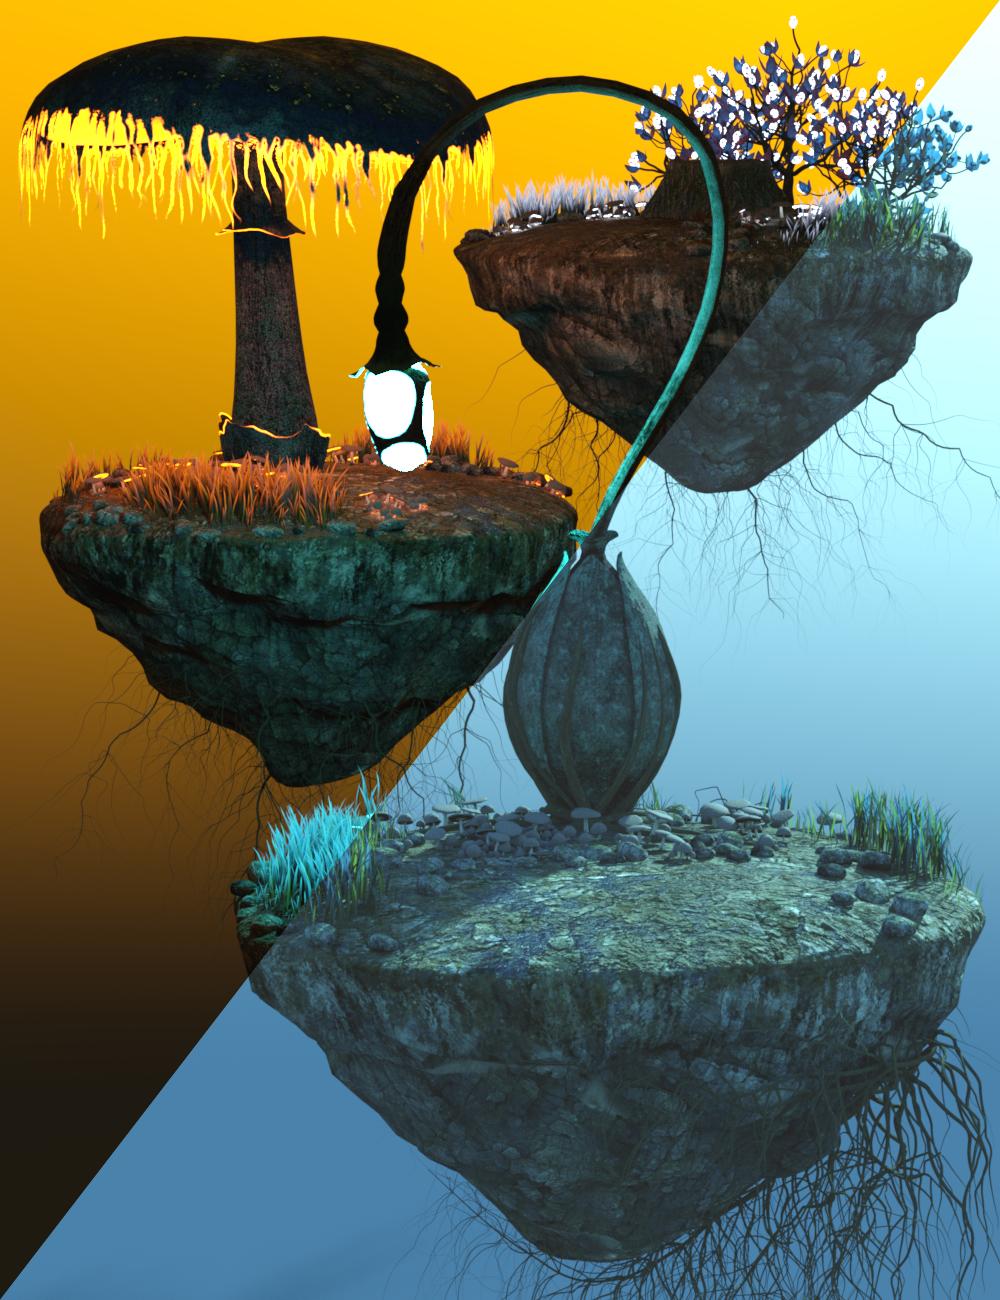 v176 Iray Fantasy Dioramas by: vikike176, 3D Models by Daz 3D